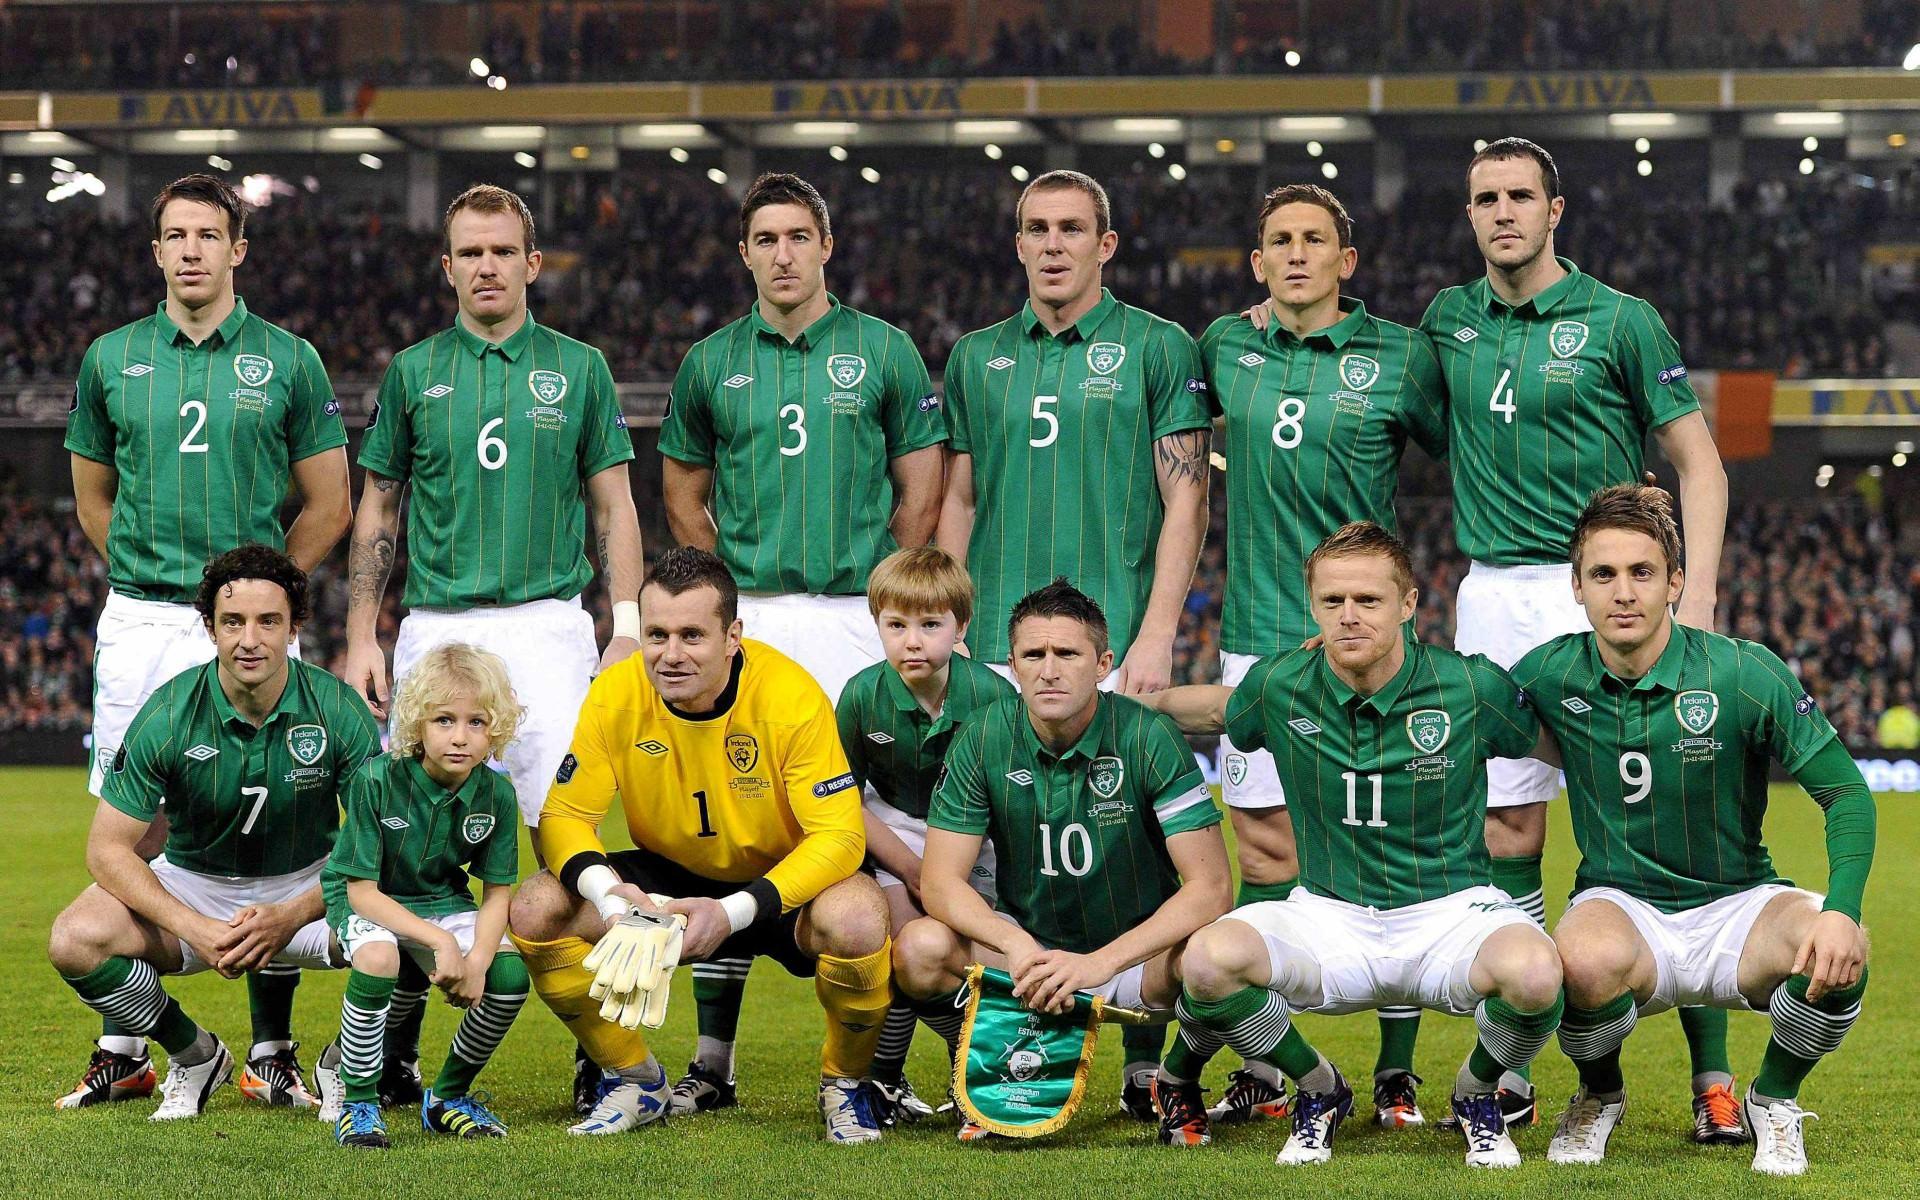 45 Northern Ireland Soccer Wallpapers   Download at WallpaperBro 1920x1200